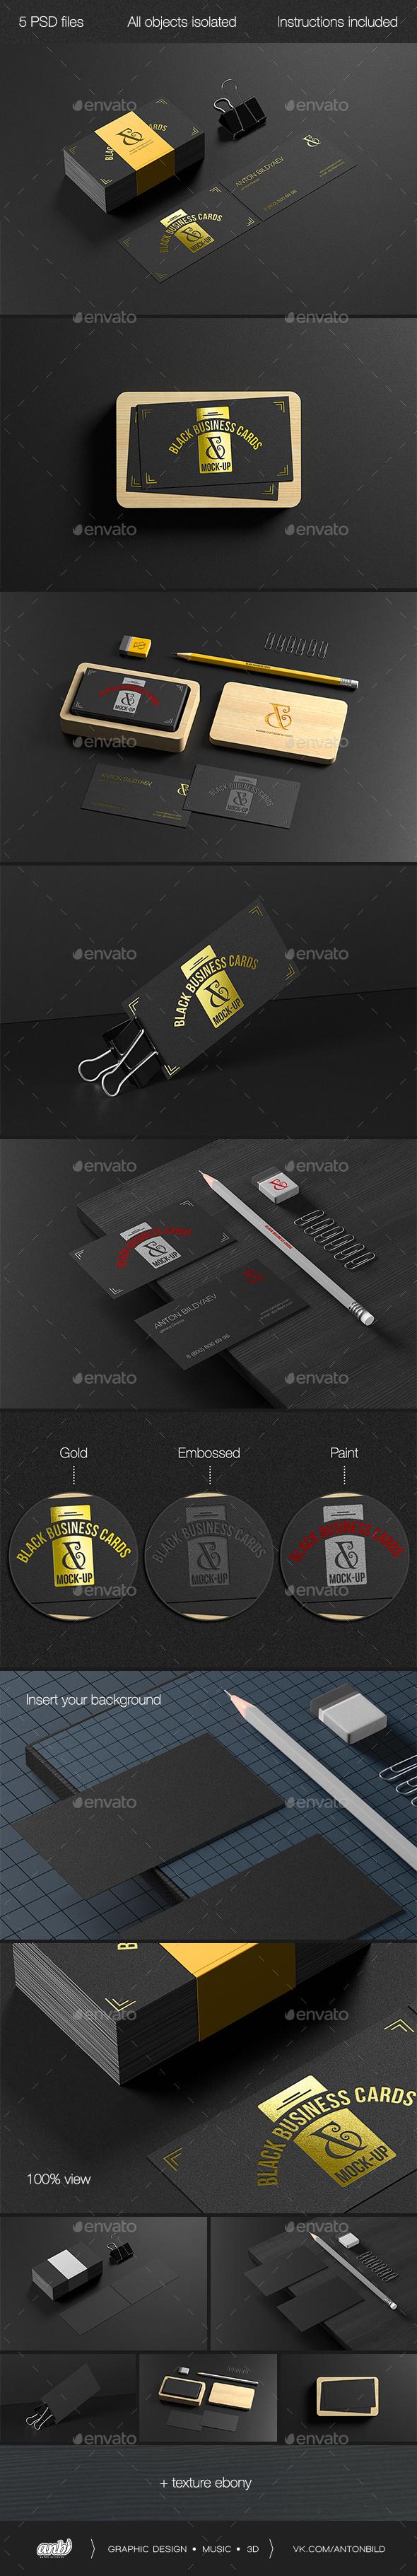 Black Business Cards Mock-up - Business Cards Print